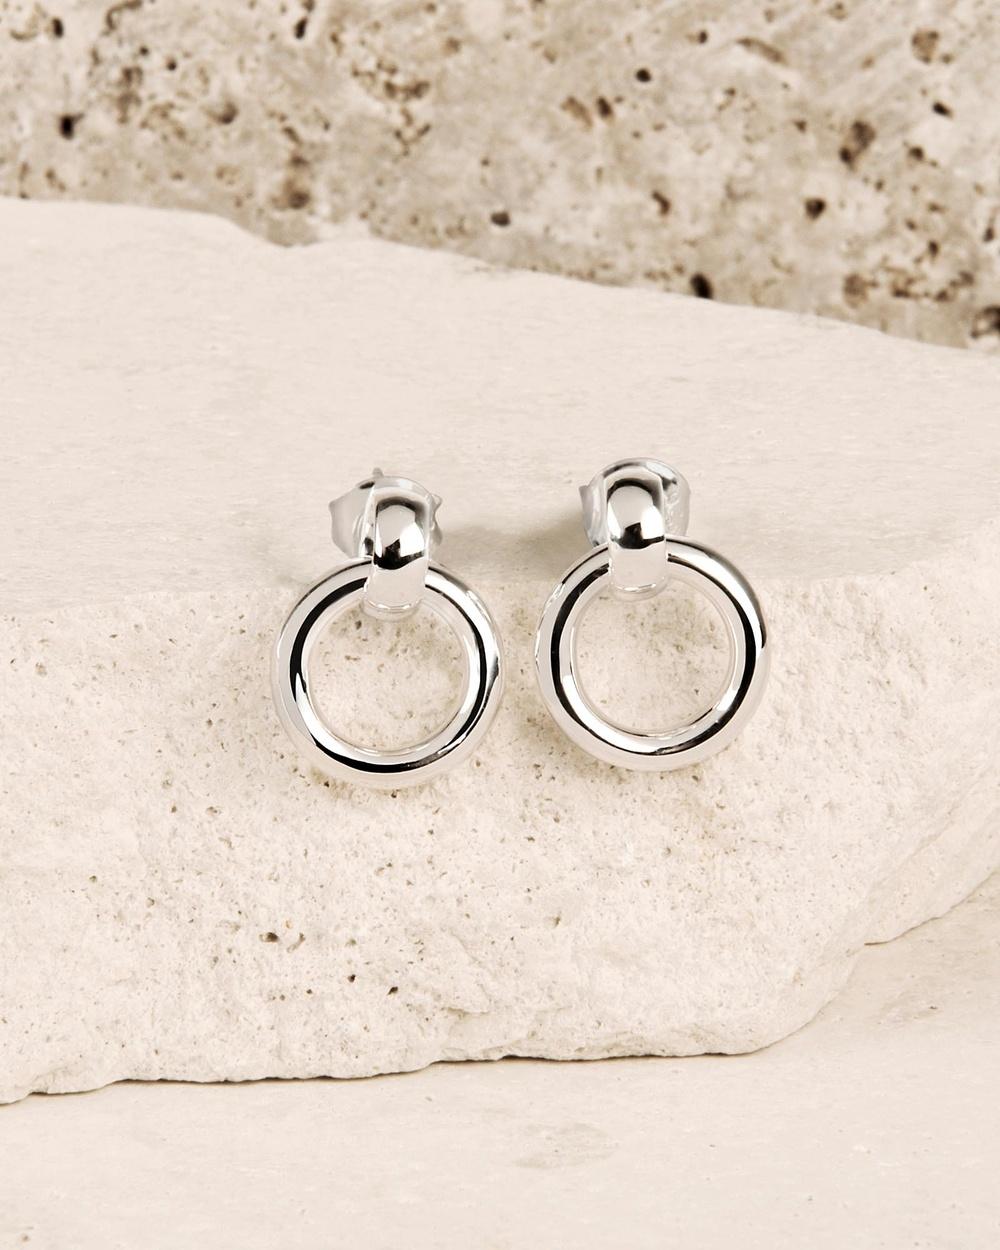 Najo Roma Stud Earrings Jewellery Silver